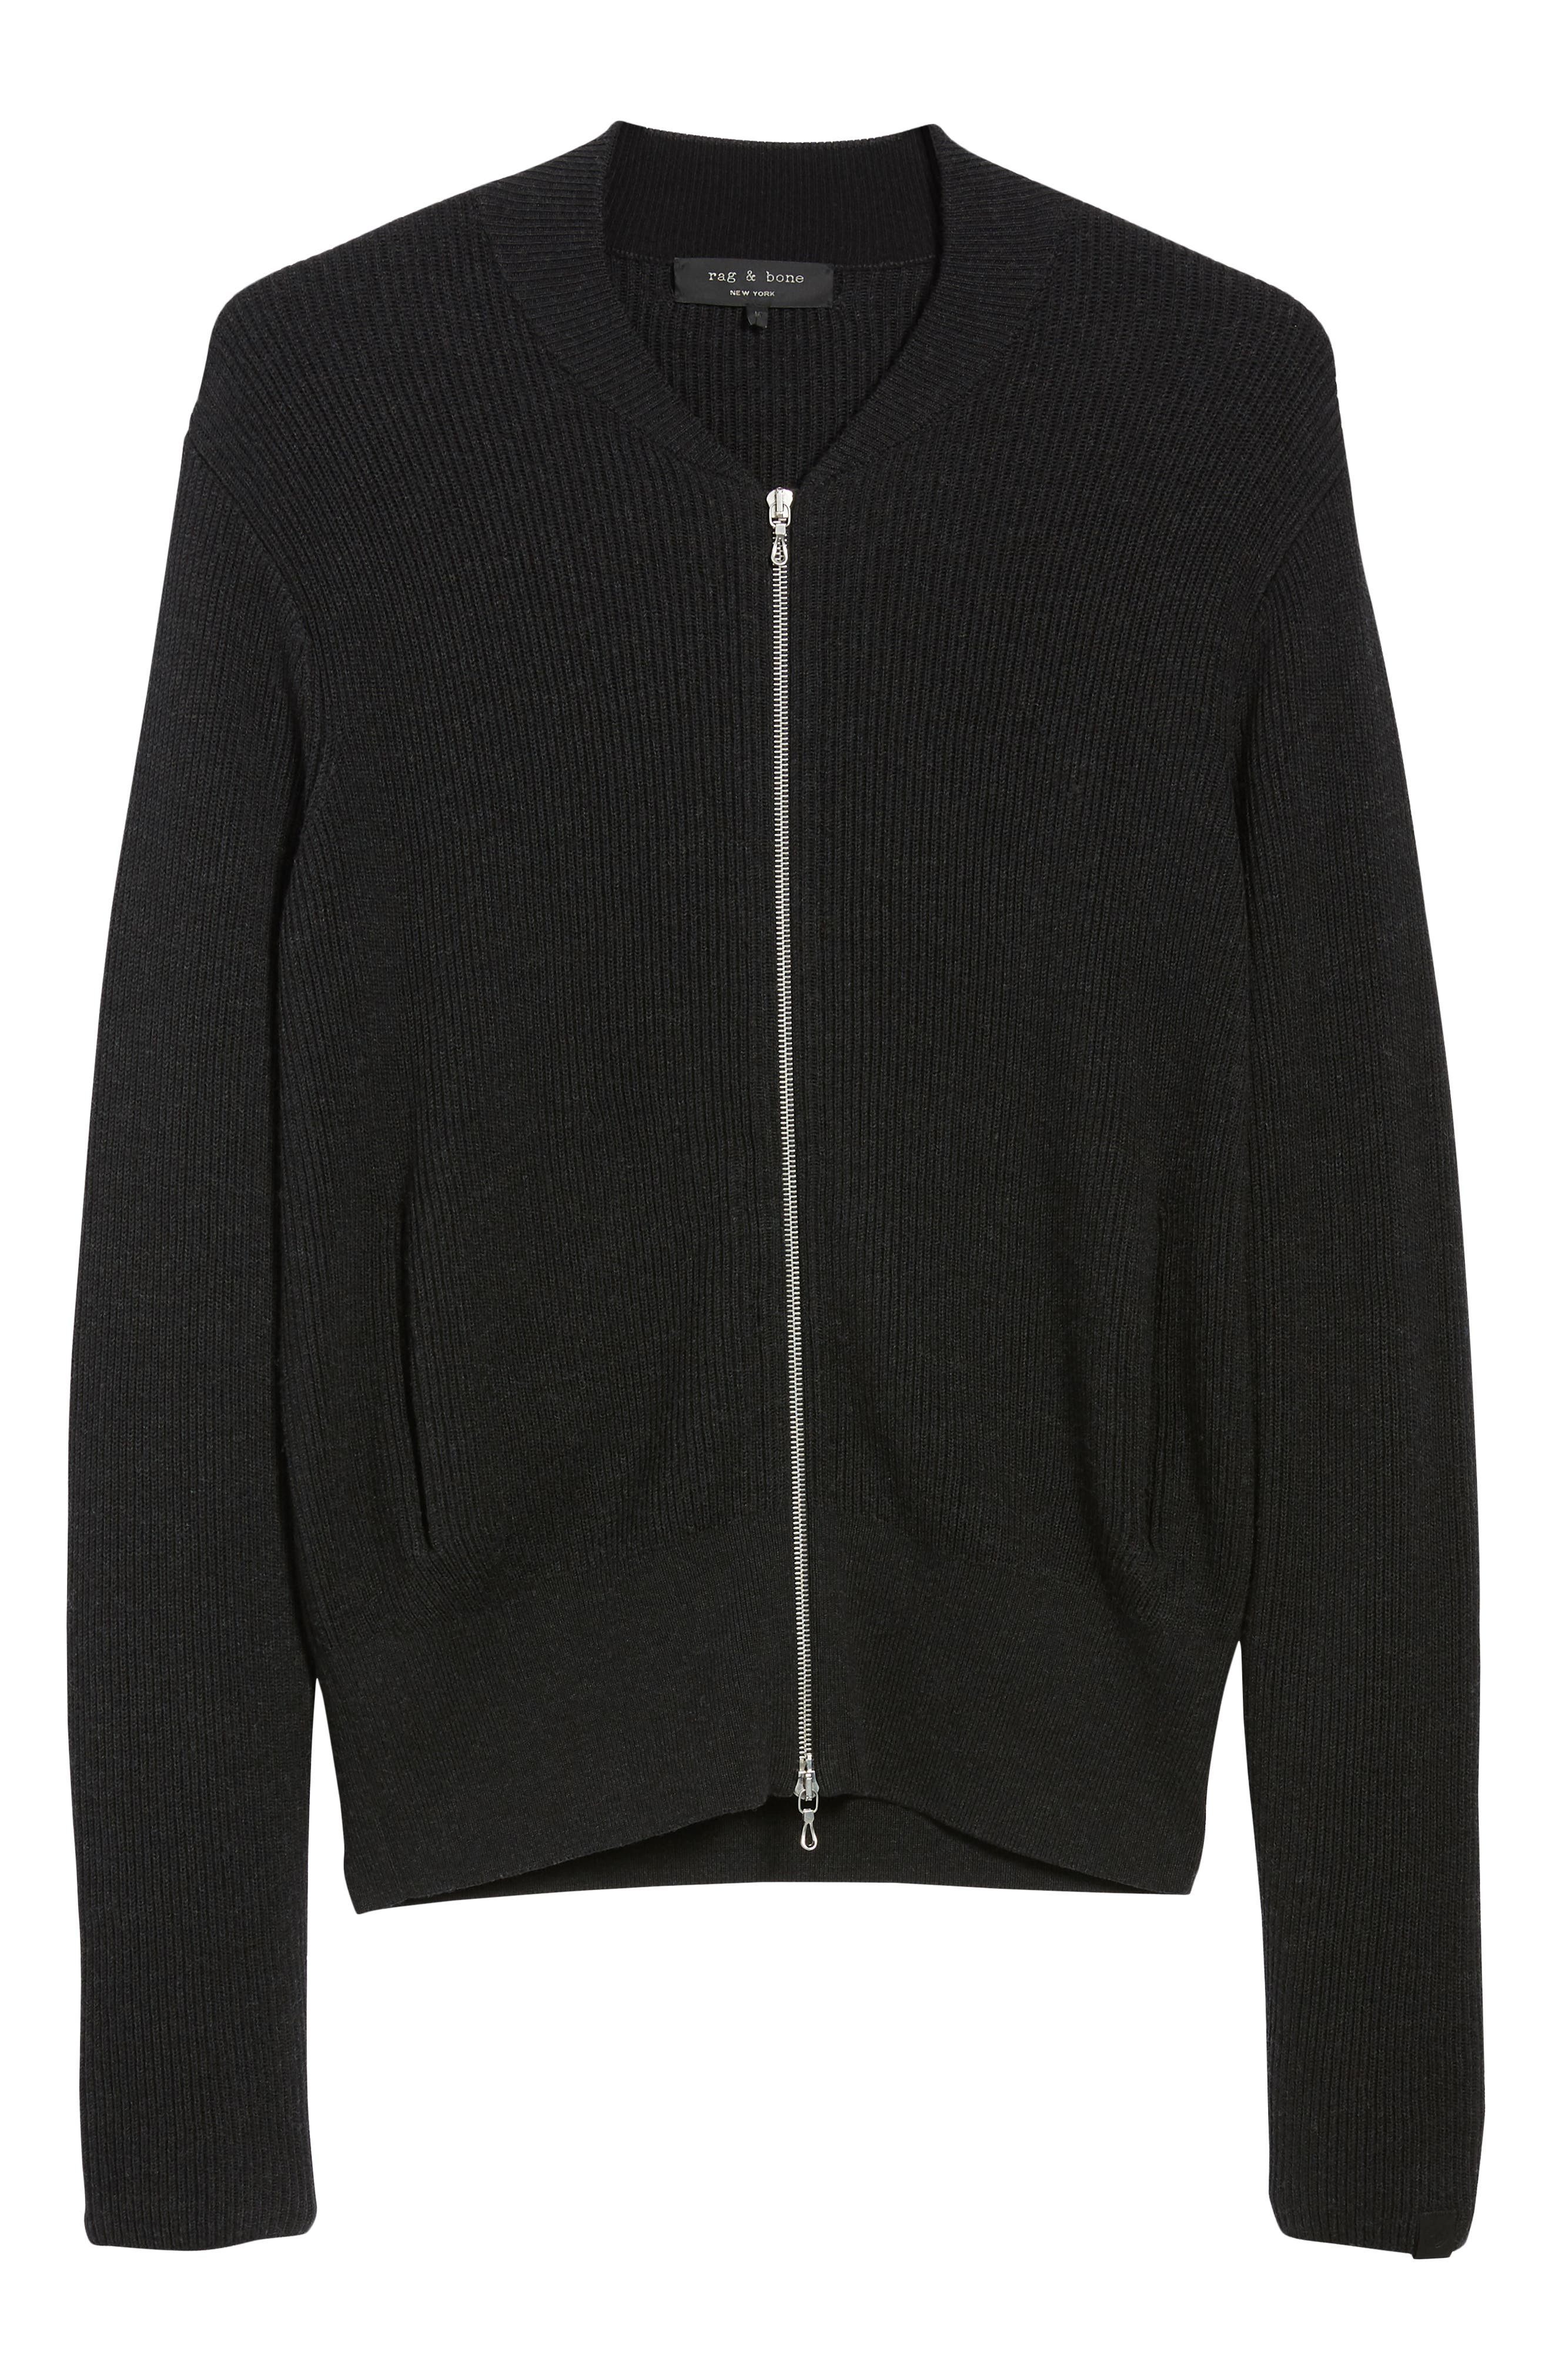 RAG & BONE, Andrew Zip Front Merino Wool Sweater, Alternate thumbnail 6, color, BLACK HEATHER